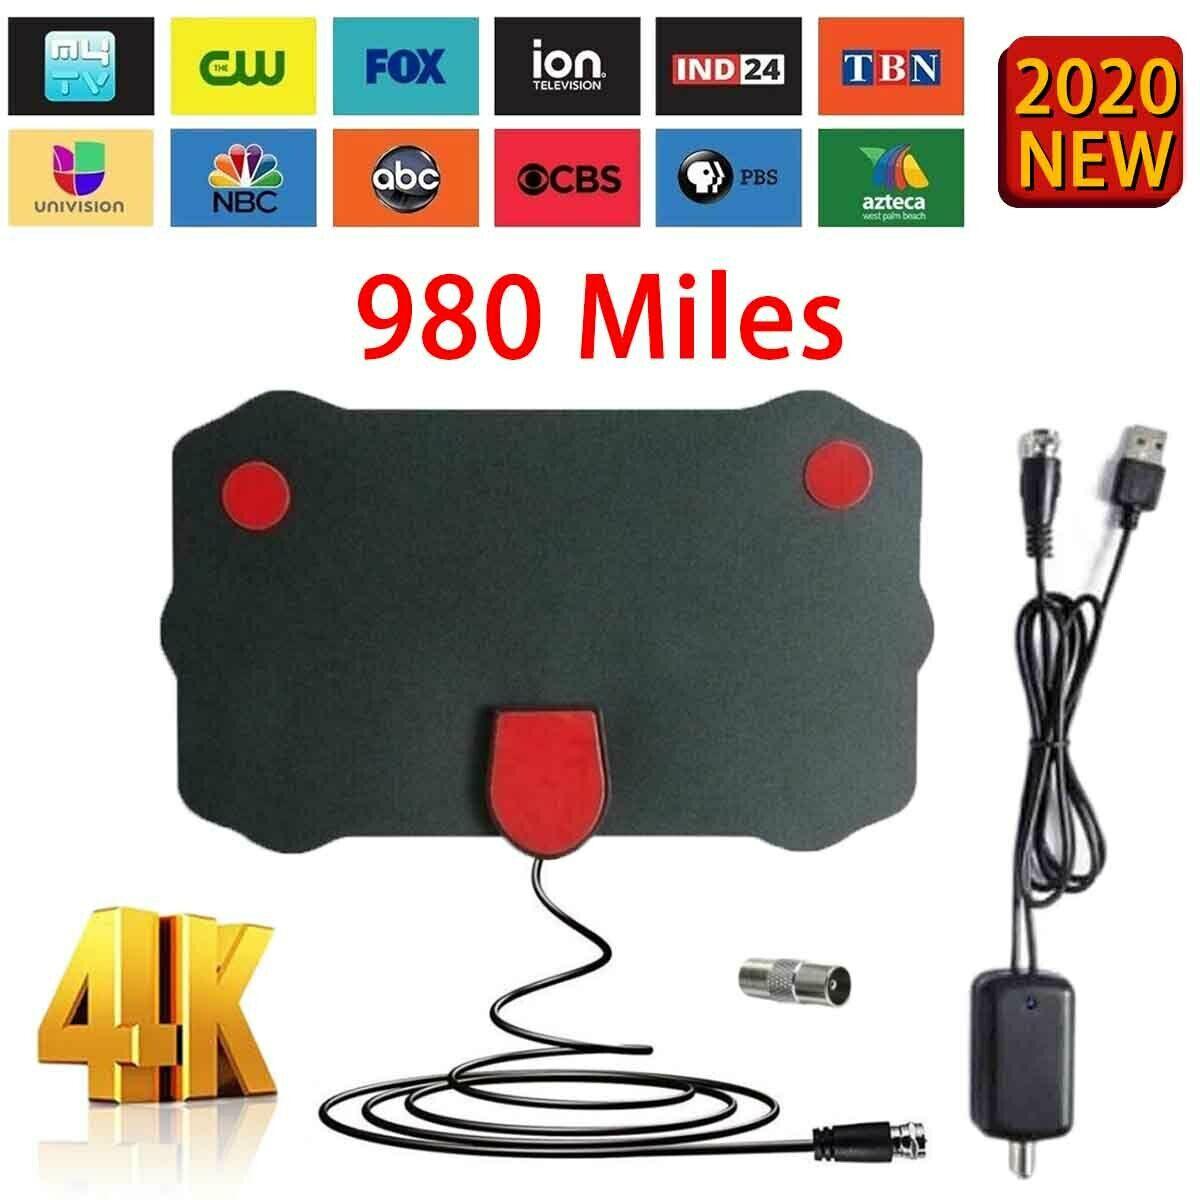 980 Miles Clear Indoor Digital TV HDTV Antenna UHF/VHF/1080p